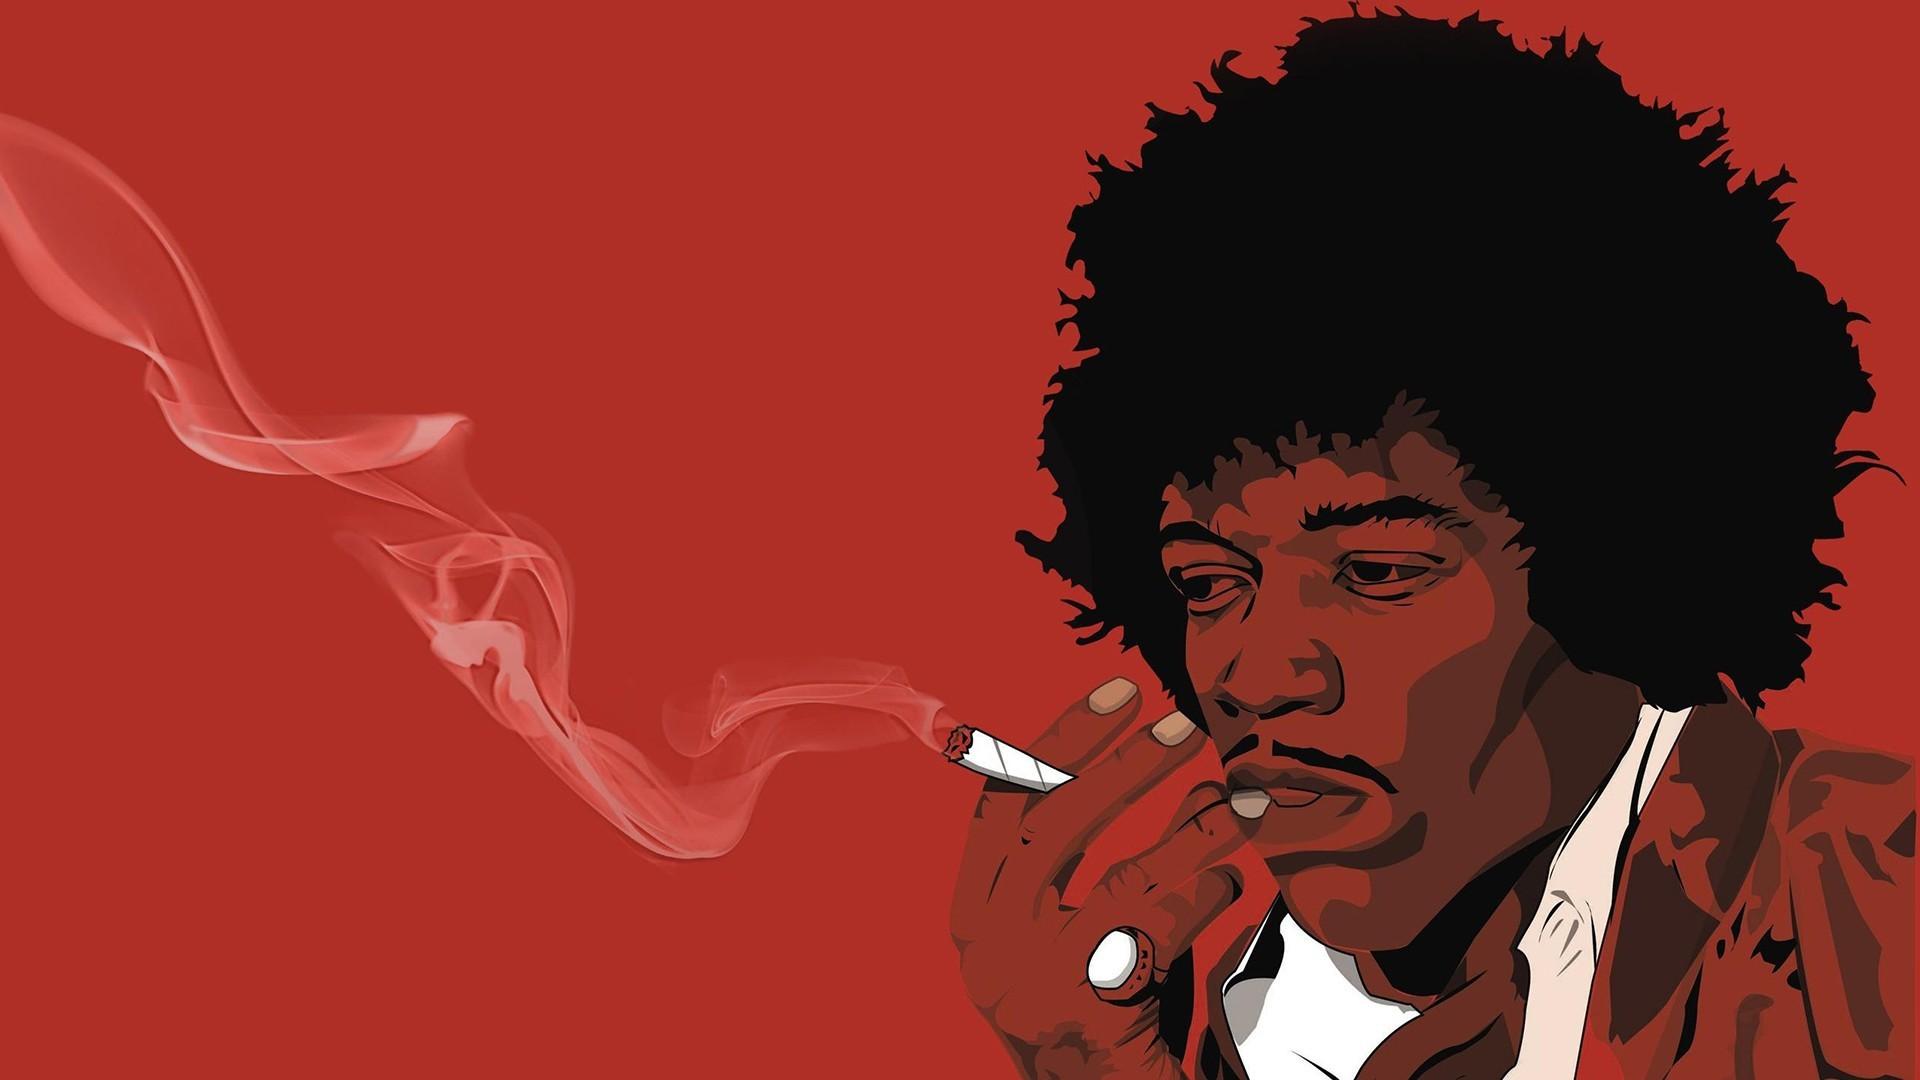 Illustration Red Cartoon Musician Fan Art Poster Jimi Hendrix Joints Organ Album Cover